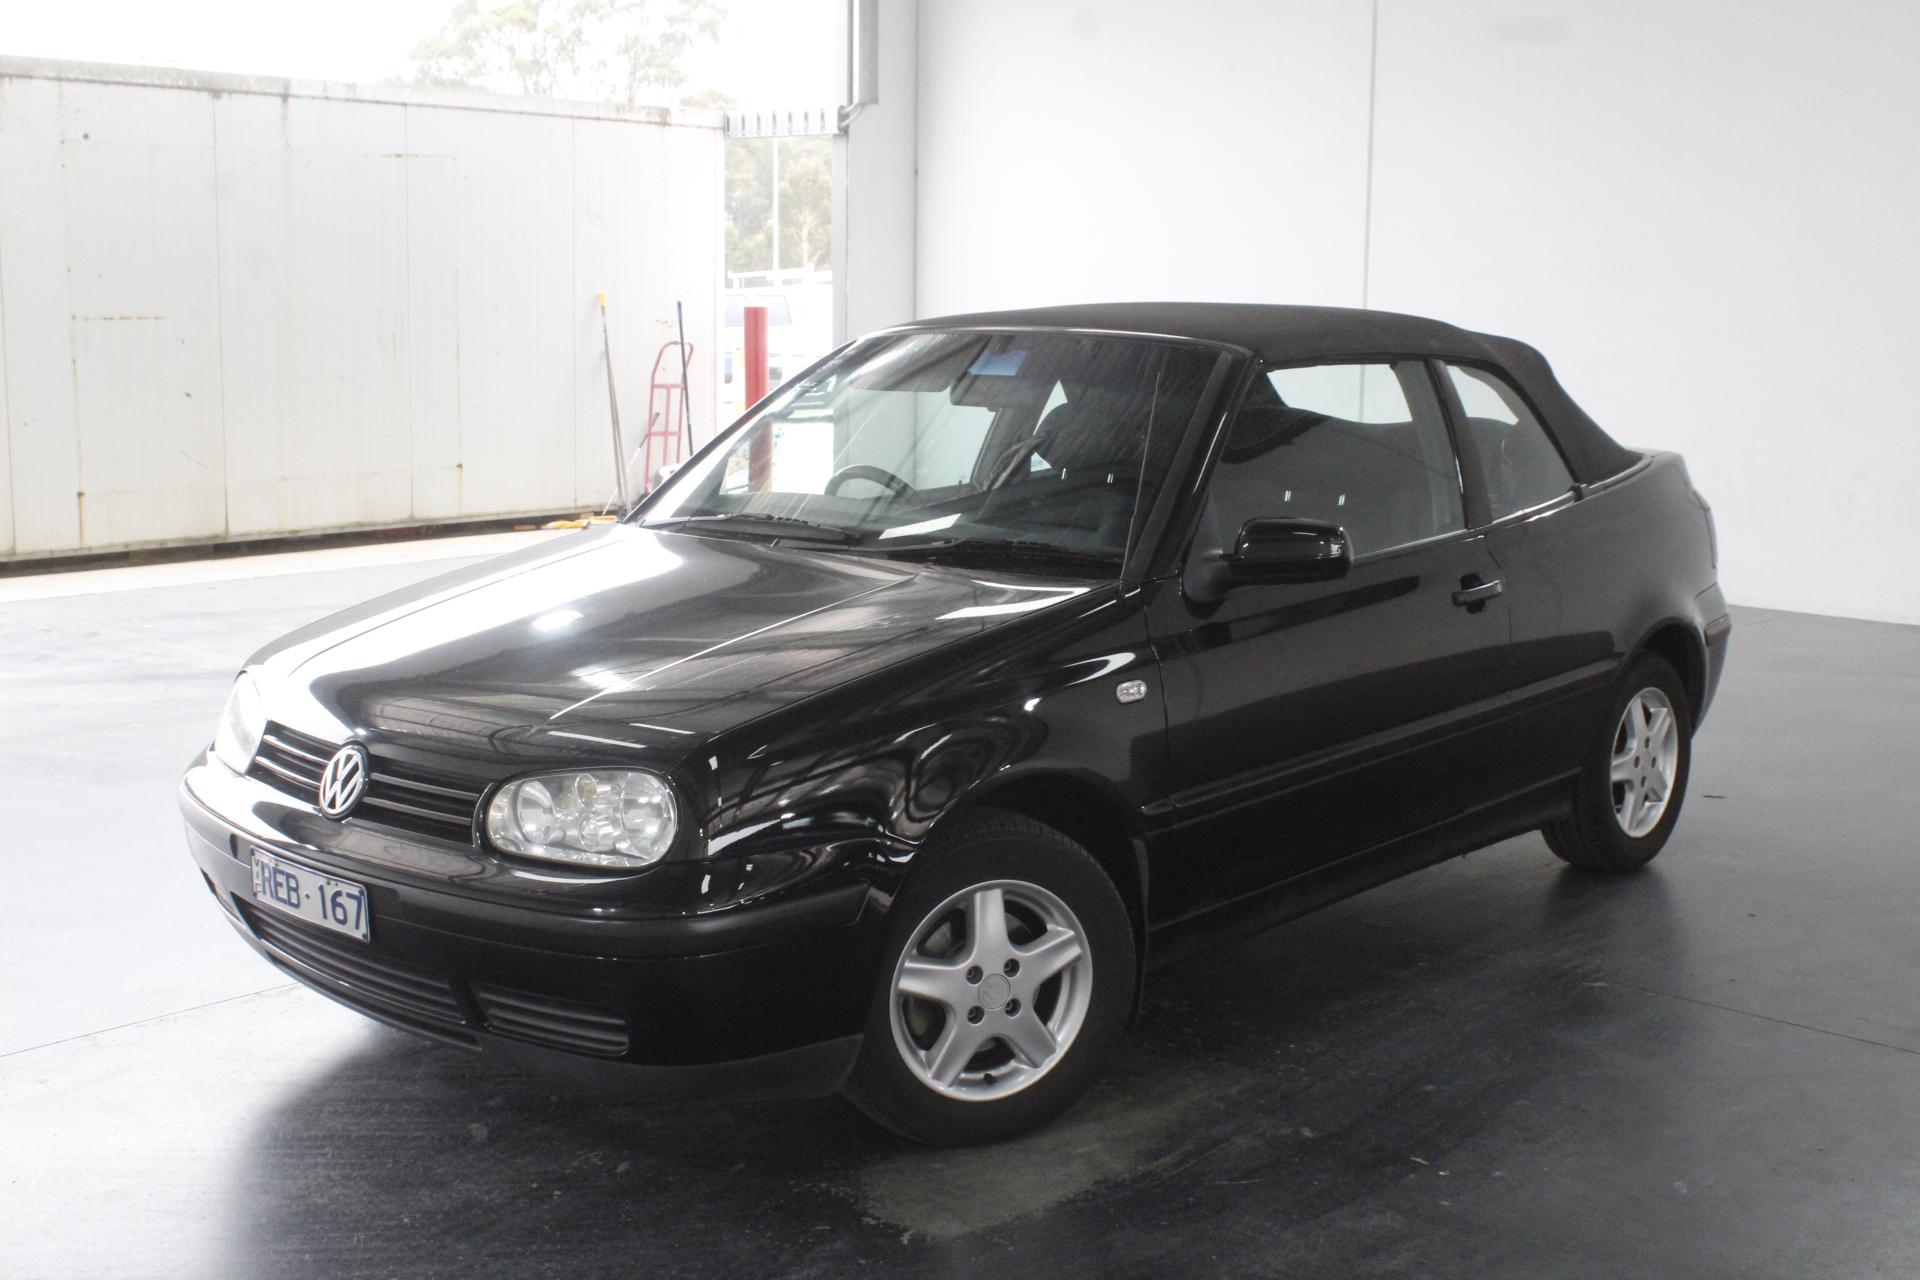 2001 Volkswagen Golf GL Manual Convertible